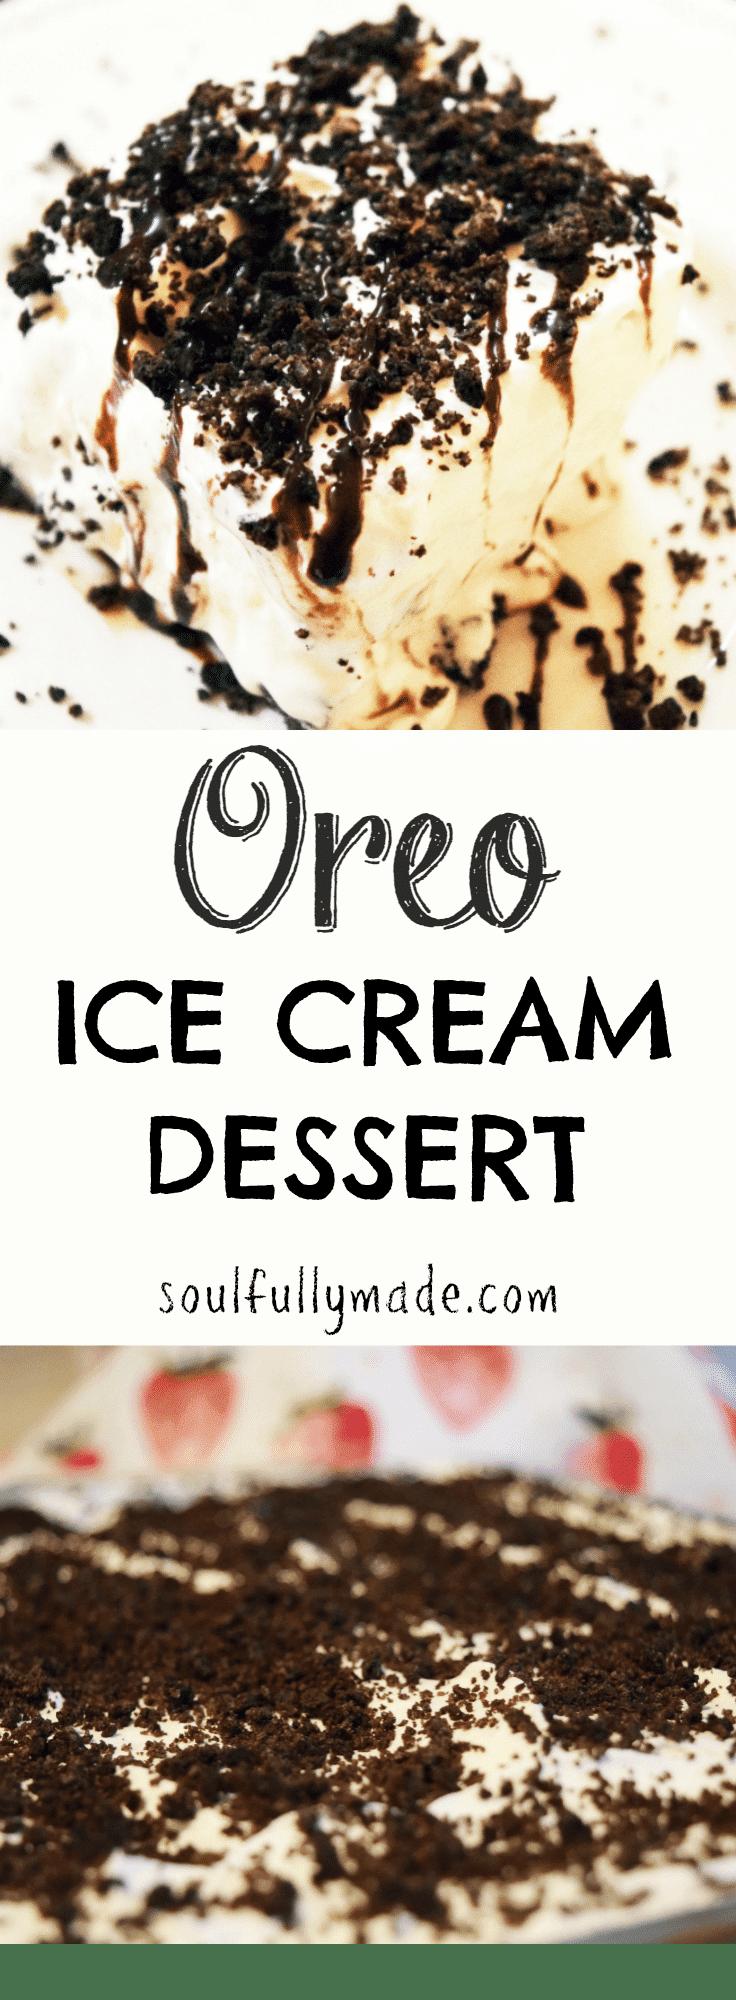 Oreo Ice Cream Dessert.